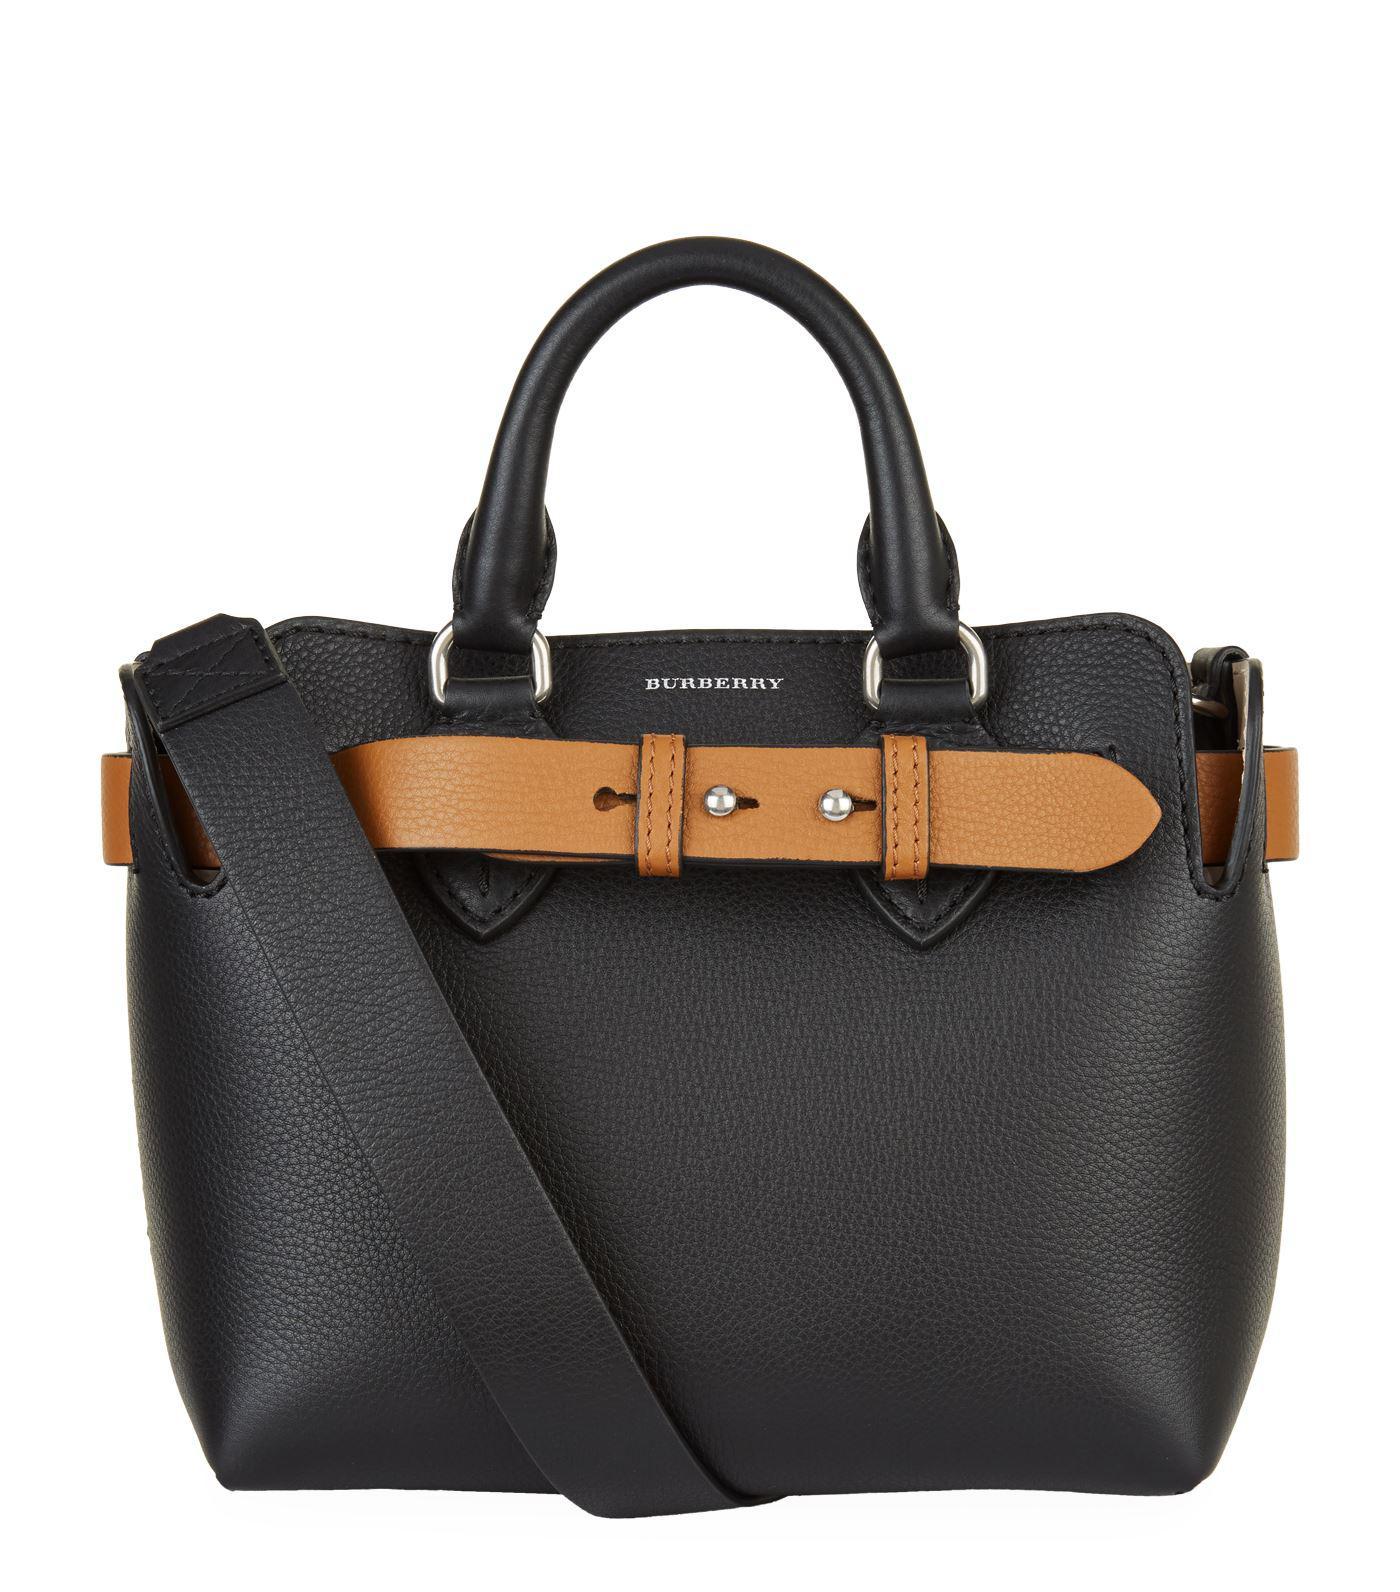 ea8ef0553ef8 Burberry - Black Baby Leather Belt Bag - Lyst. View fullscreen